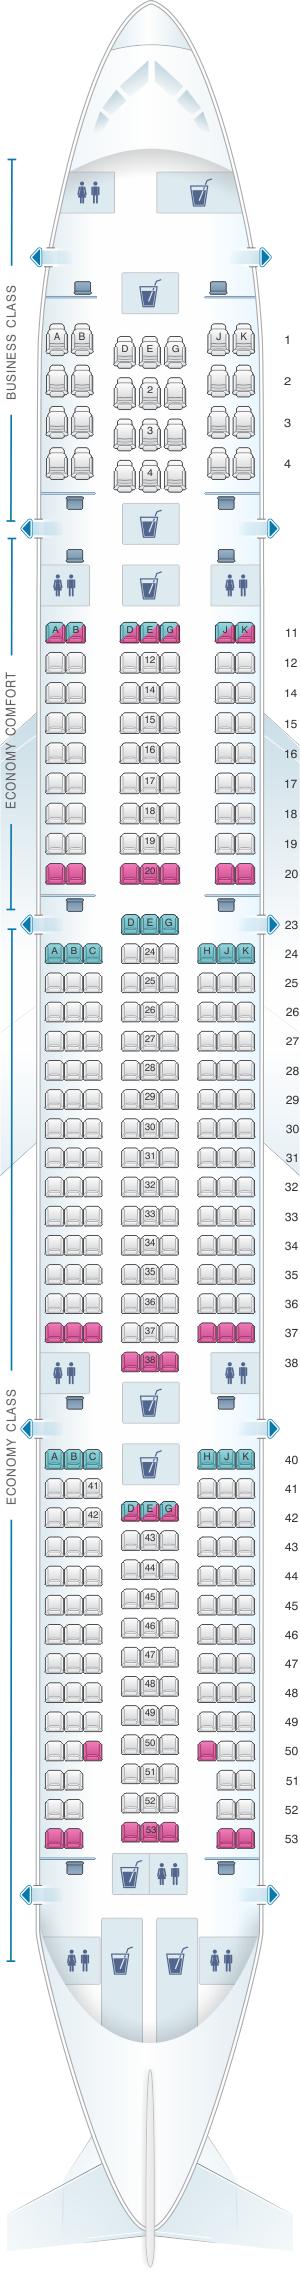 Seat Map Turkish Airlines Boeing B777 300er Seatmaestro